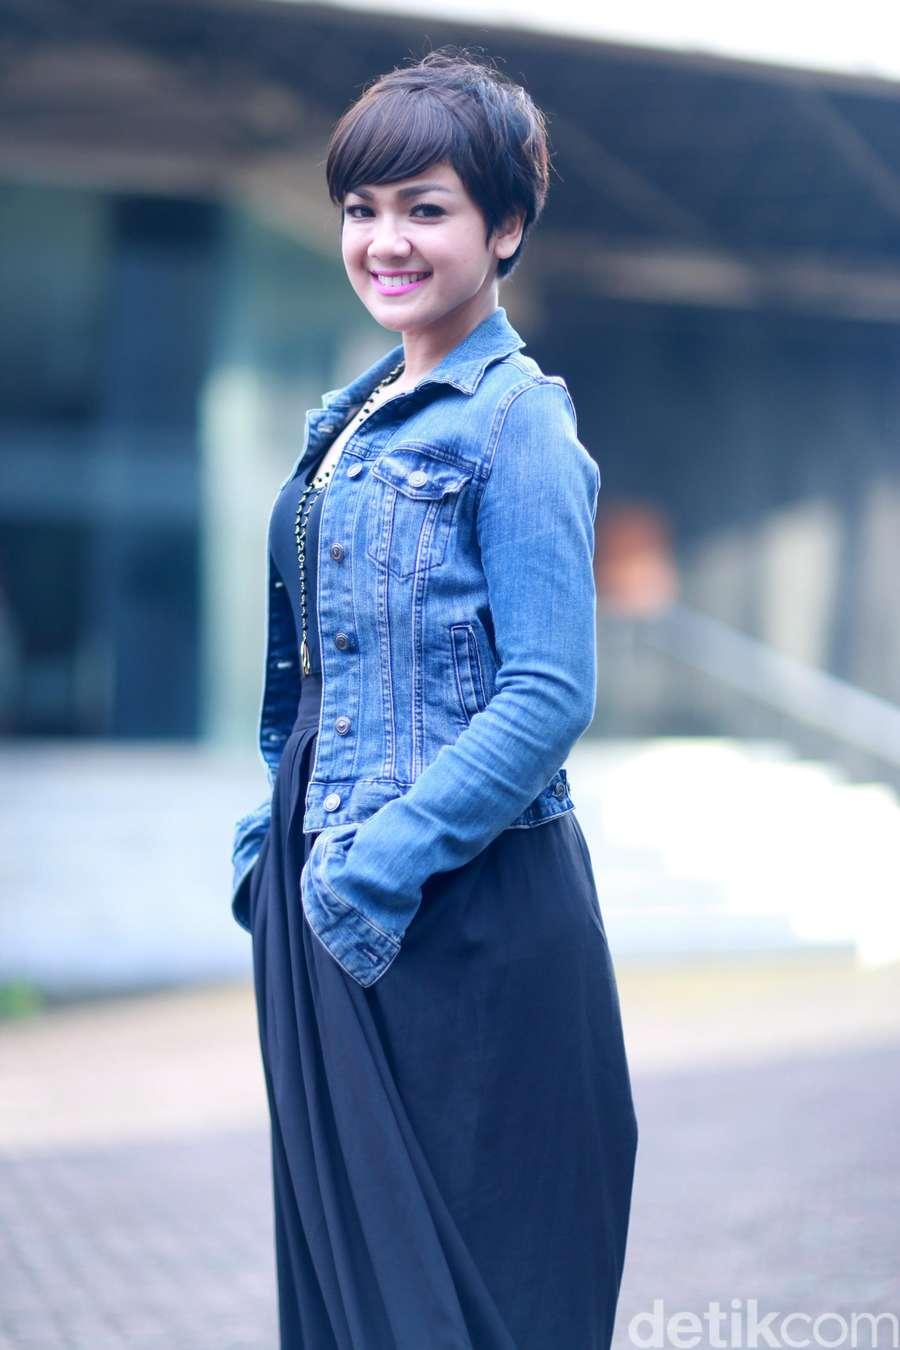 Berambut Superpendek, Nirina Zubir Fresh di Usia 36 Tahun